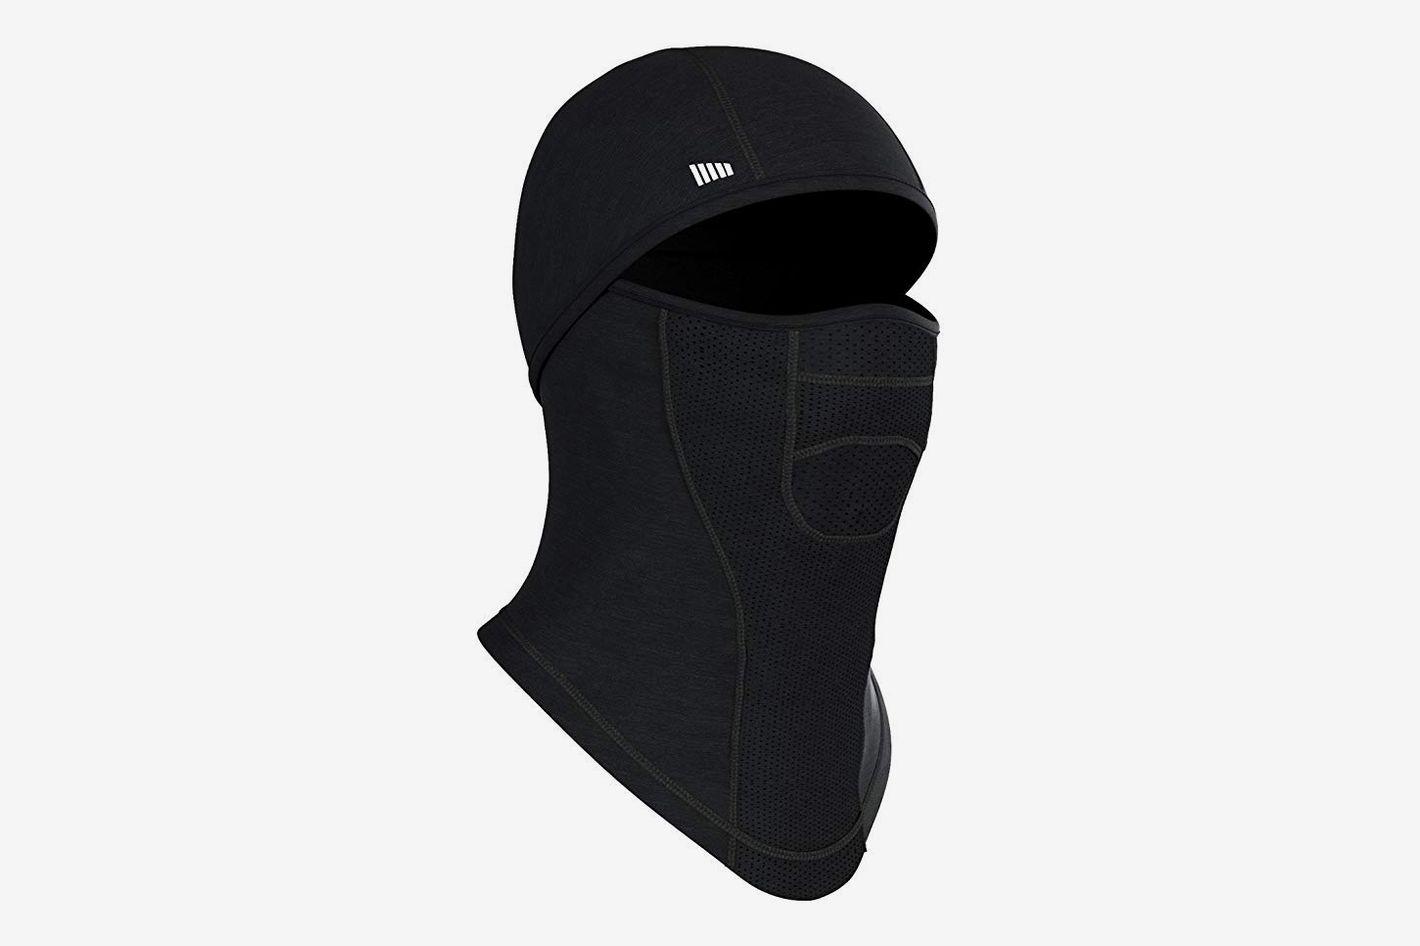 Self Pro Balaclava - Windproof Ski Mask - Cold Weather Face Motorcycle Mask  at Amazon 17ab81132f